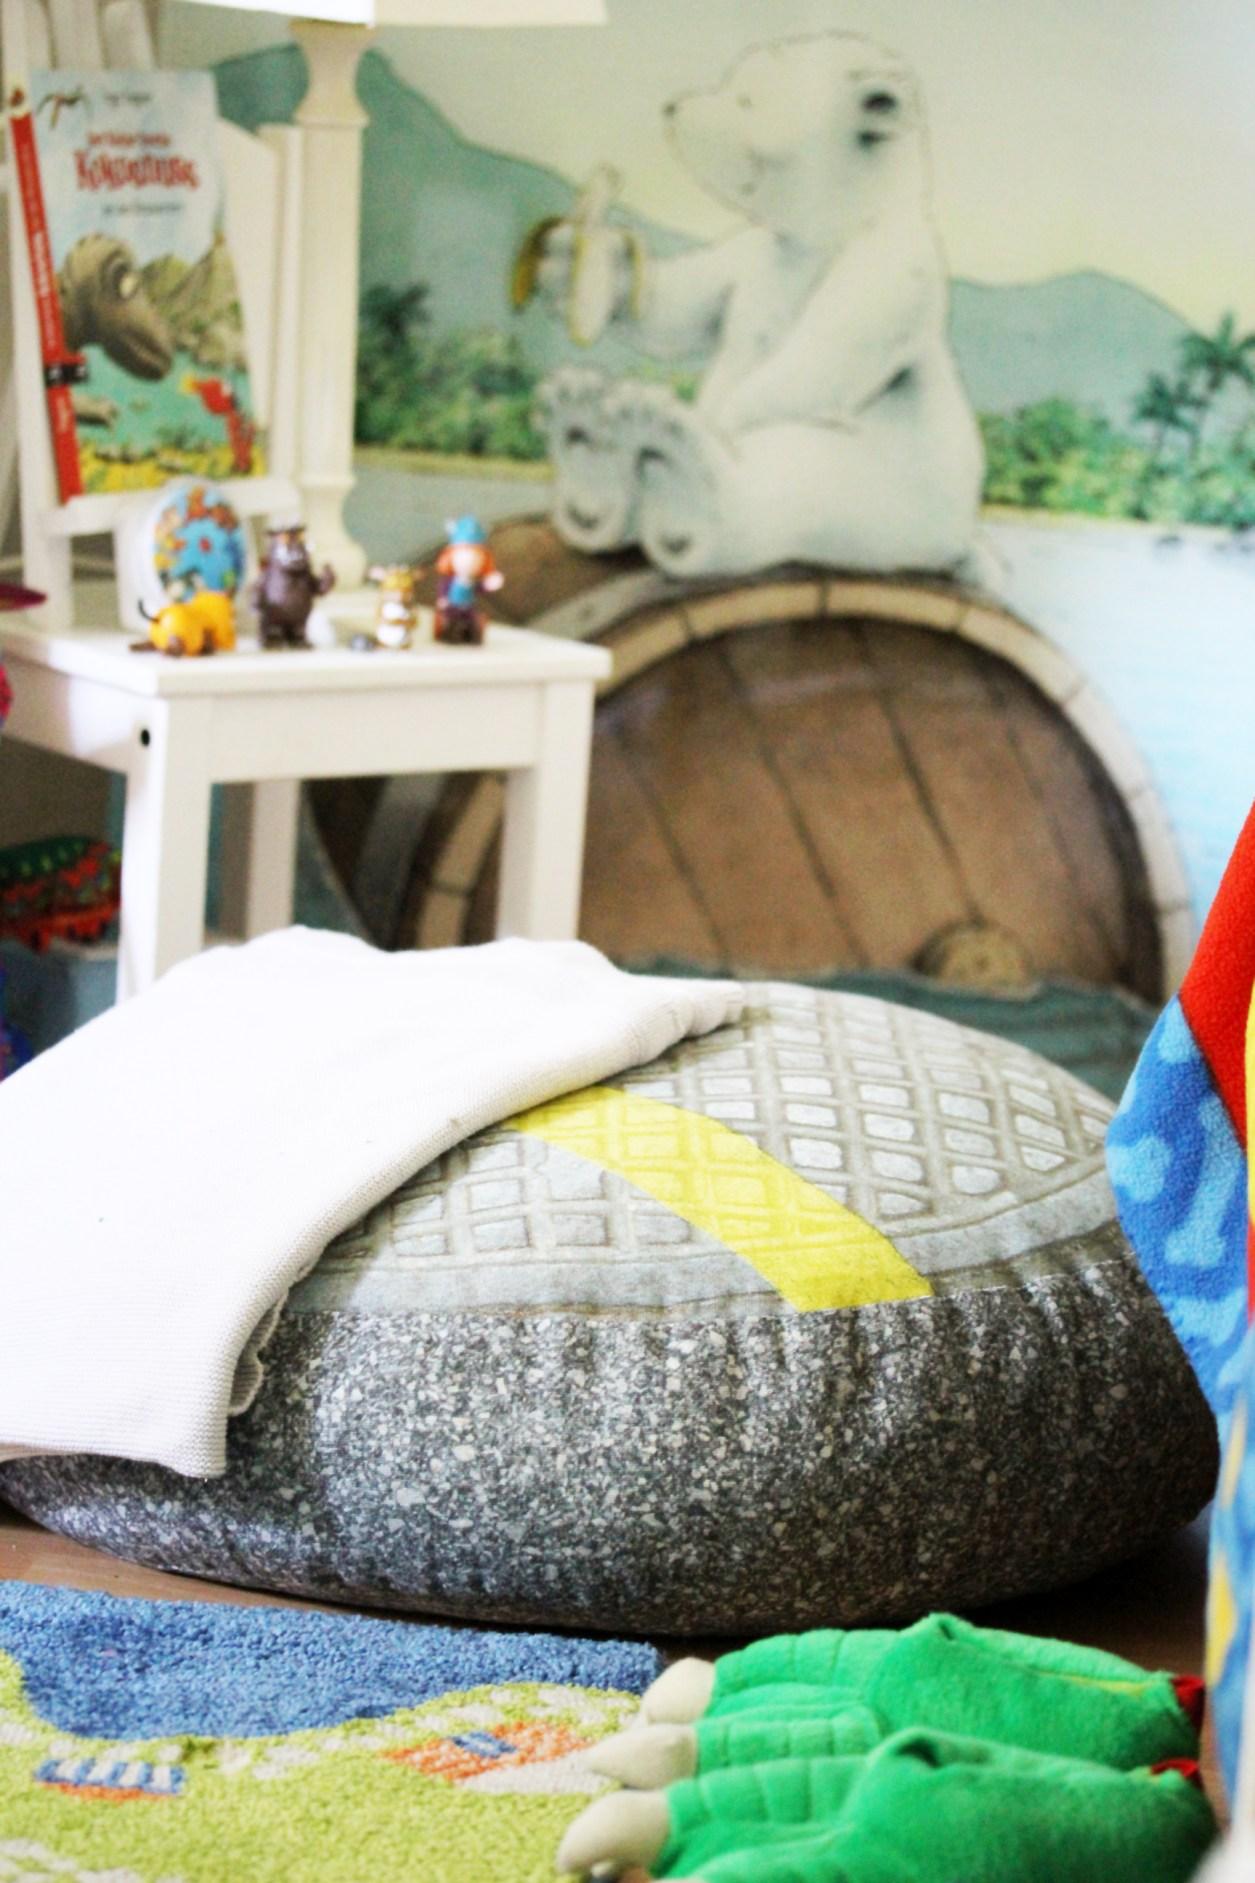 Full Size of Wandbilder Kinderzimmer Makeover Frs Wandbild Wohnzimmer Regal Weiß Regale Schlafzimmer Sofa Kinderzimmer Wandbild Kinderzimmer